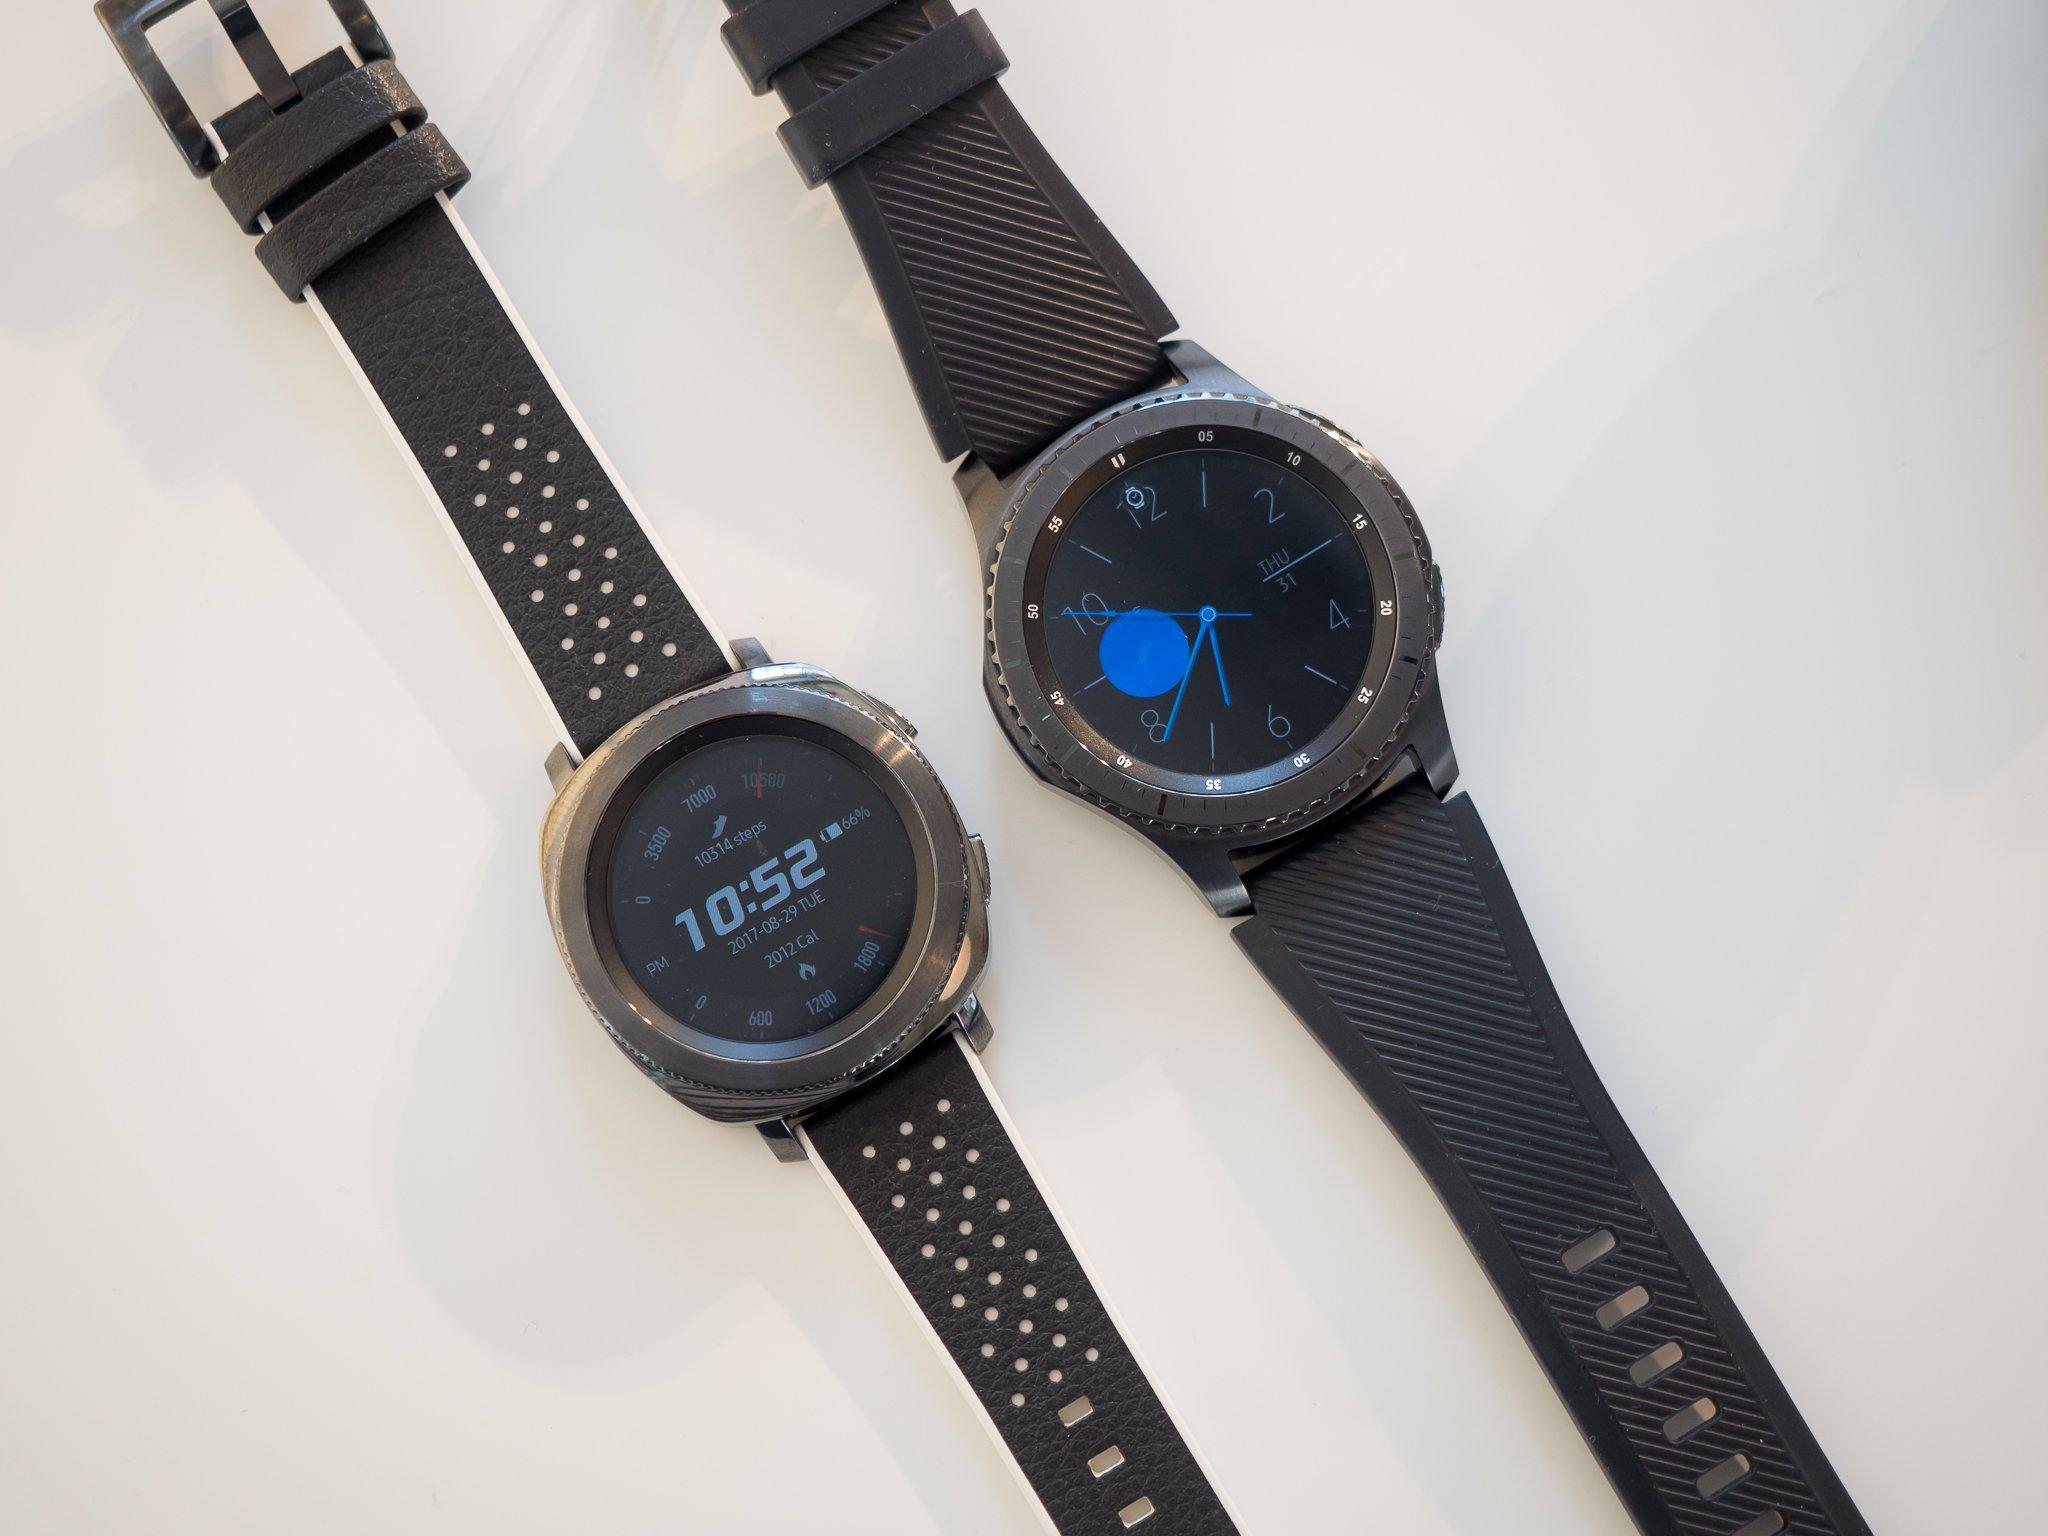 【Smart Watch】Samsung Gear Sport 簡易開箱和一星期的使用感想 - Android 手機專區 - 電腦手機 - 論壇 - 佳禮資訊網